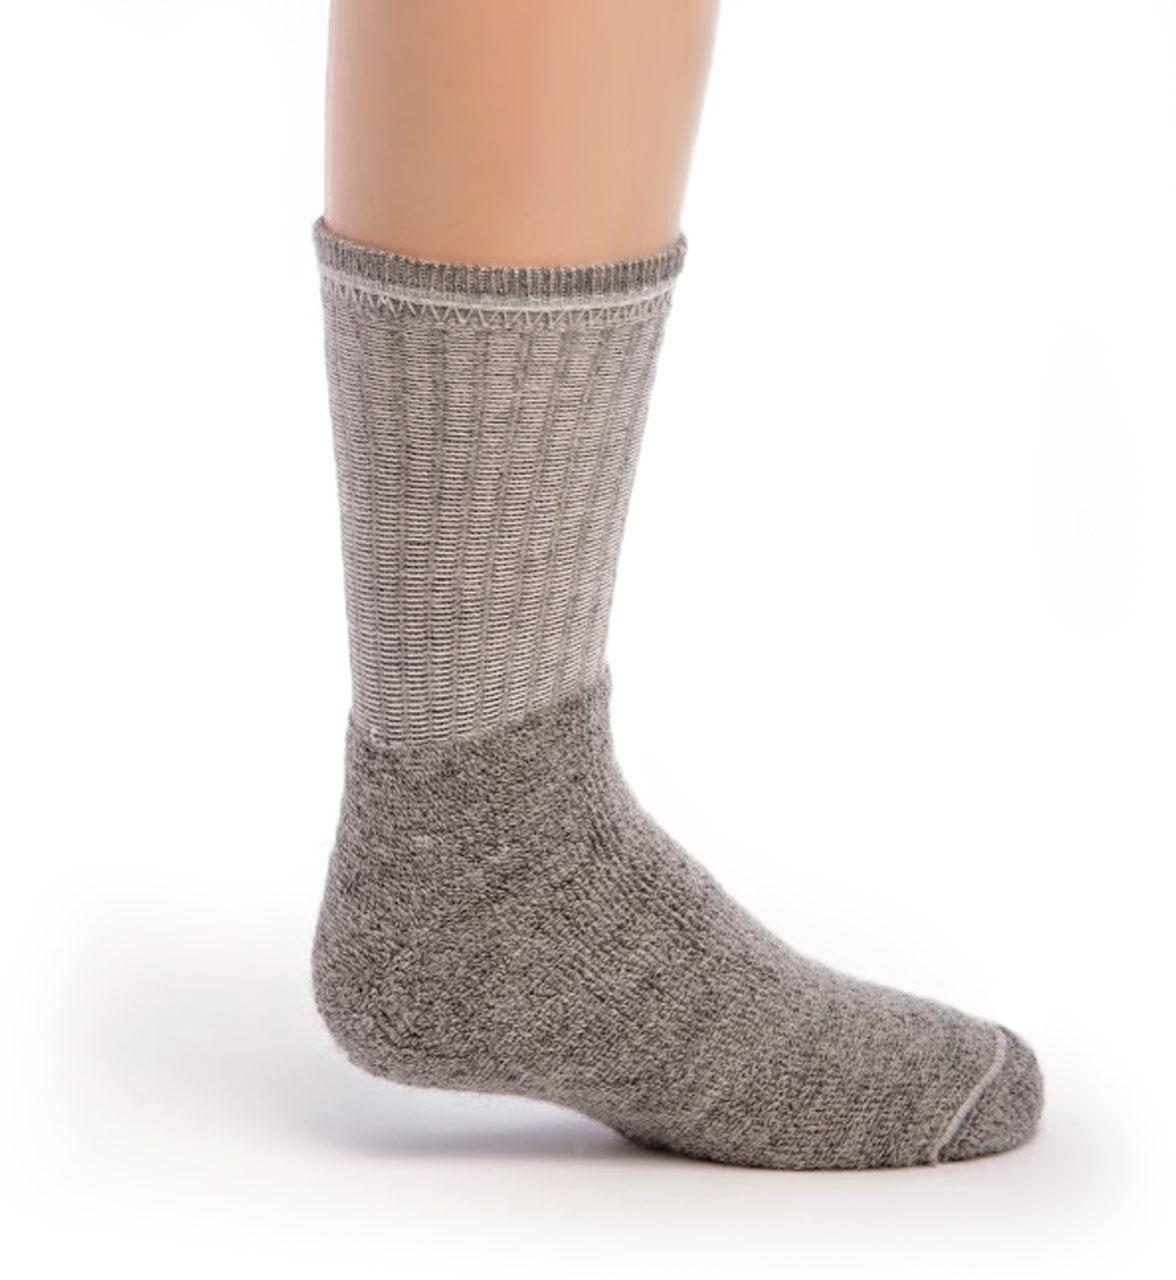 Kid's Outdoor Alpaca Socks Inside